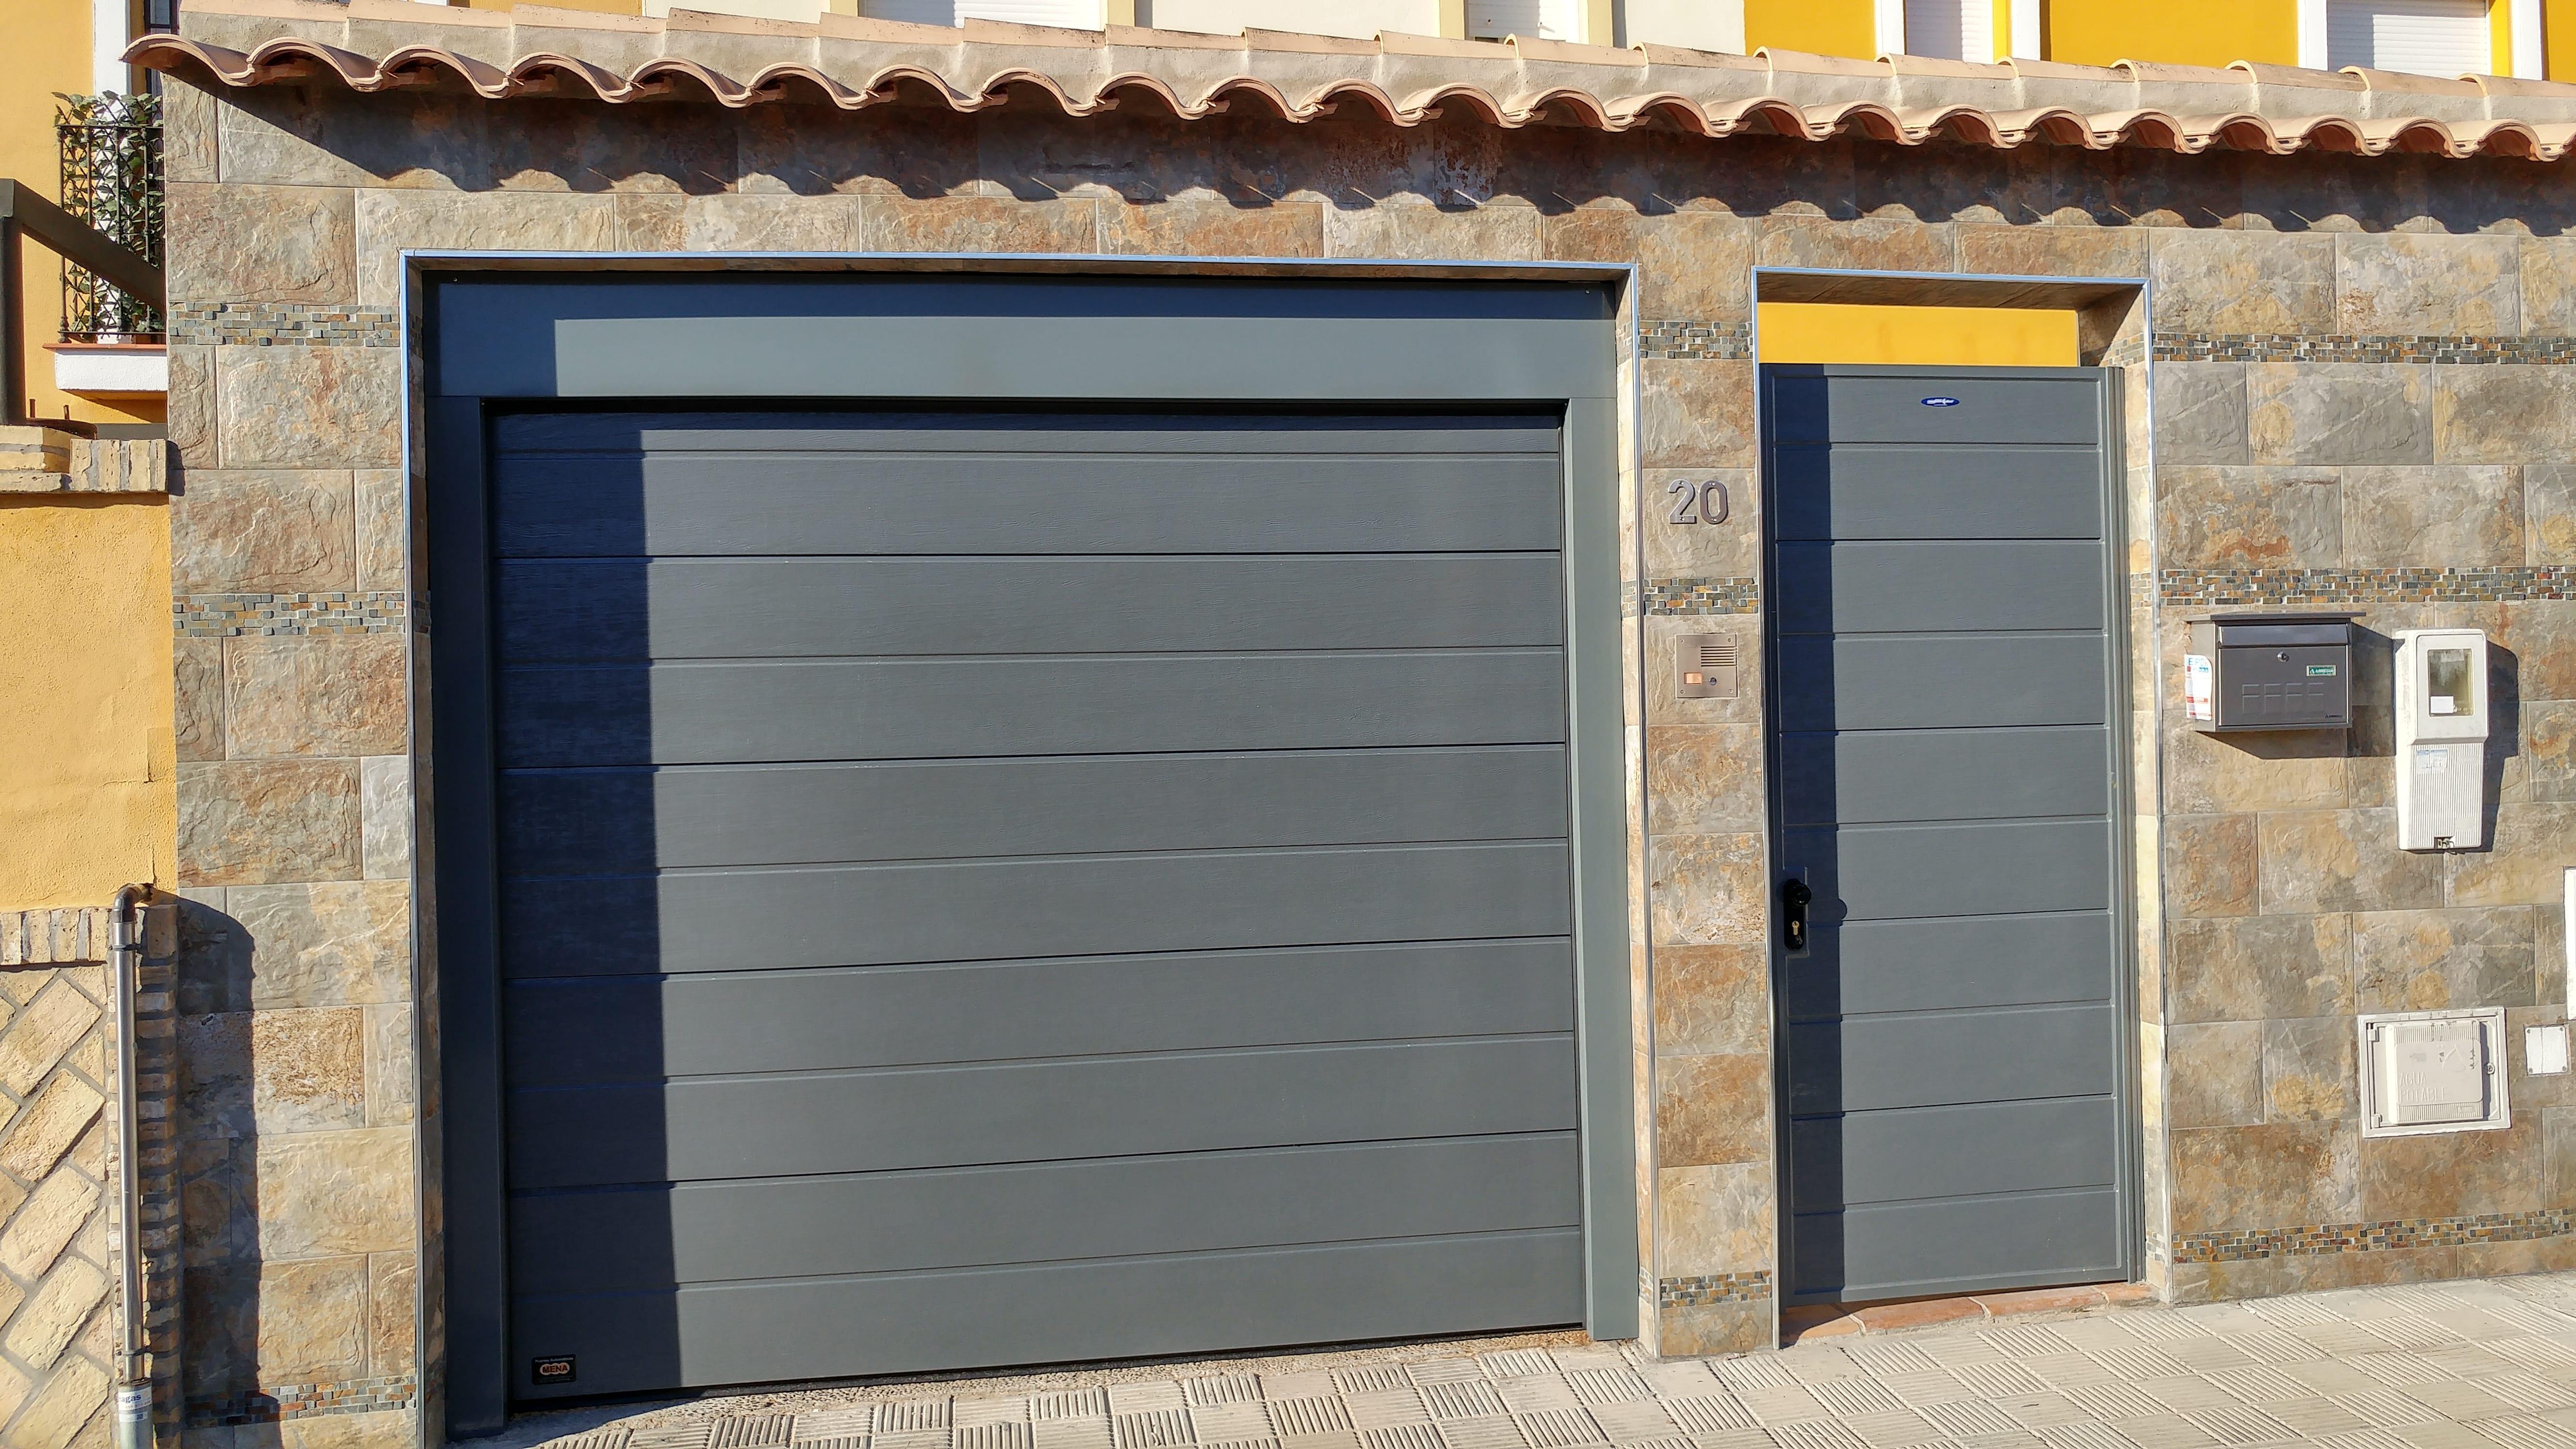 Puertas autom ticas de garaje puertas autom ticas mena - Mecanismo puerta garaje ...